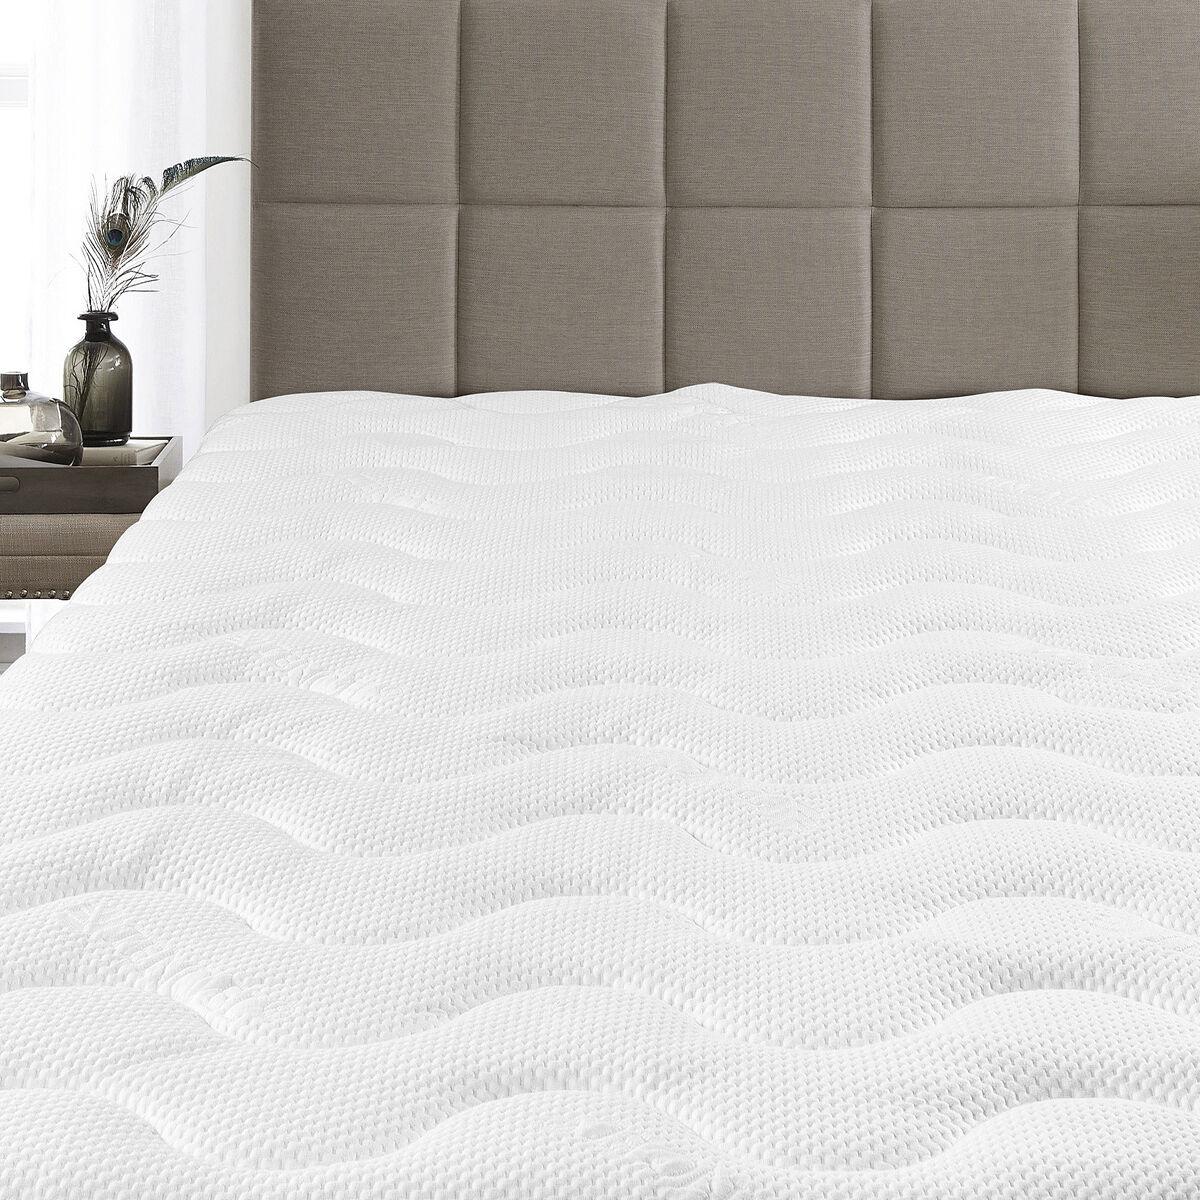 Super Soft Waterproof Lyocell from Eucalyptus Tencel Jacquard Mattress Pad